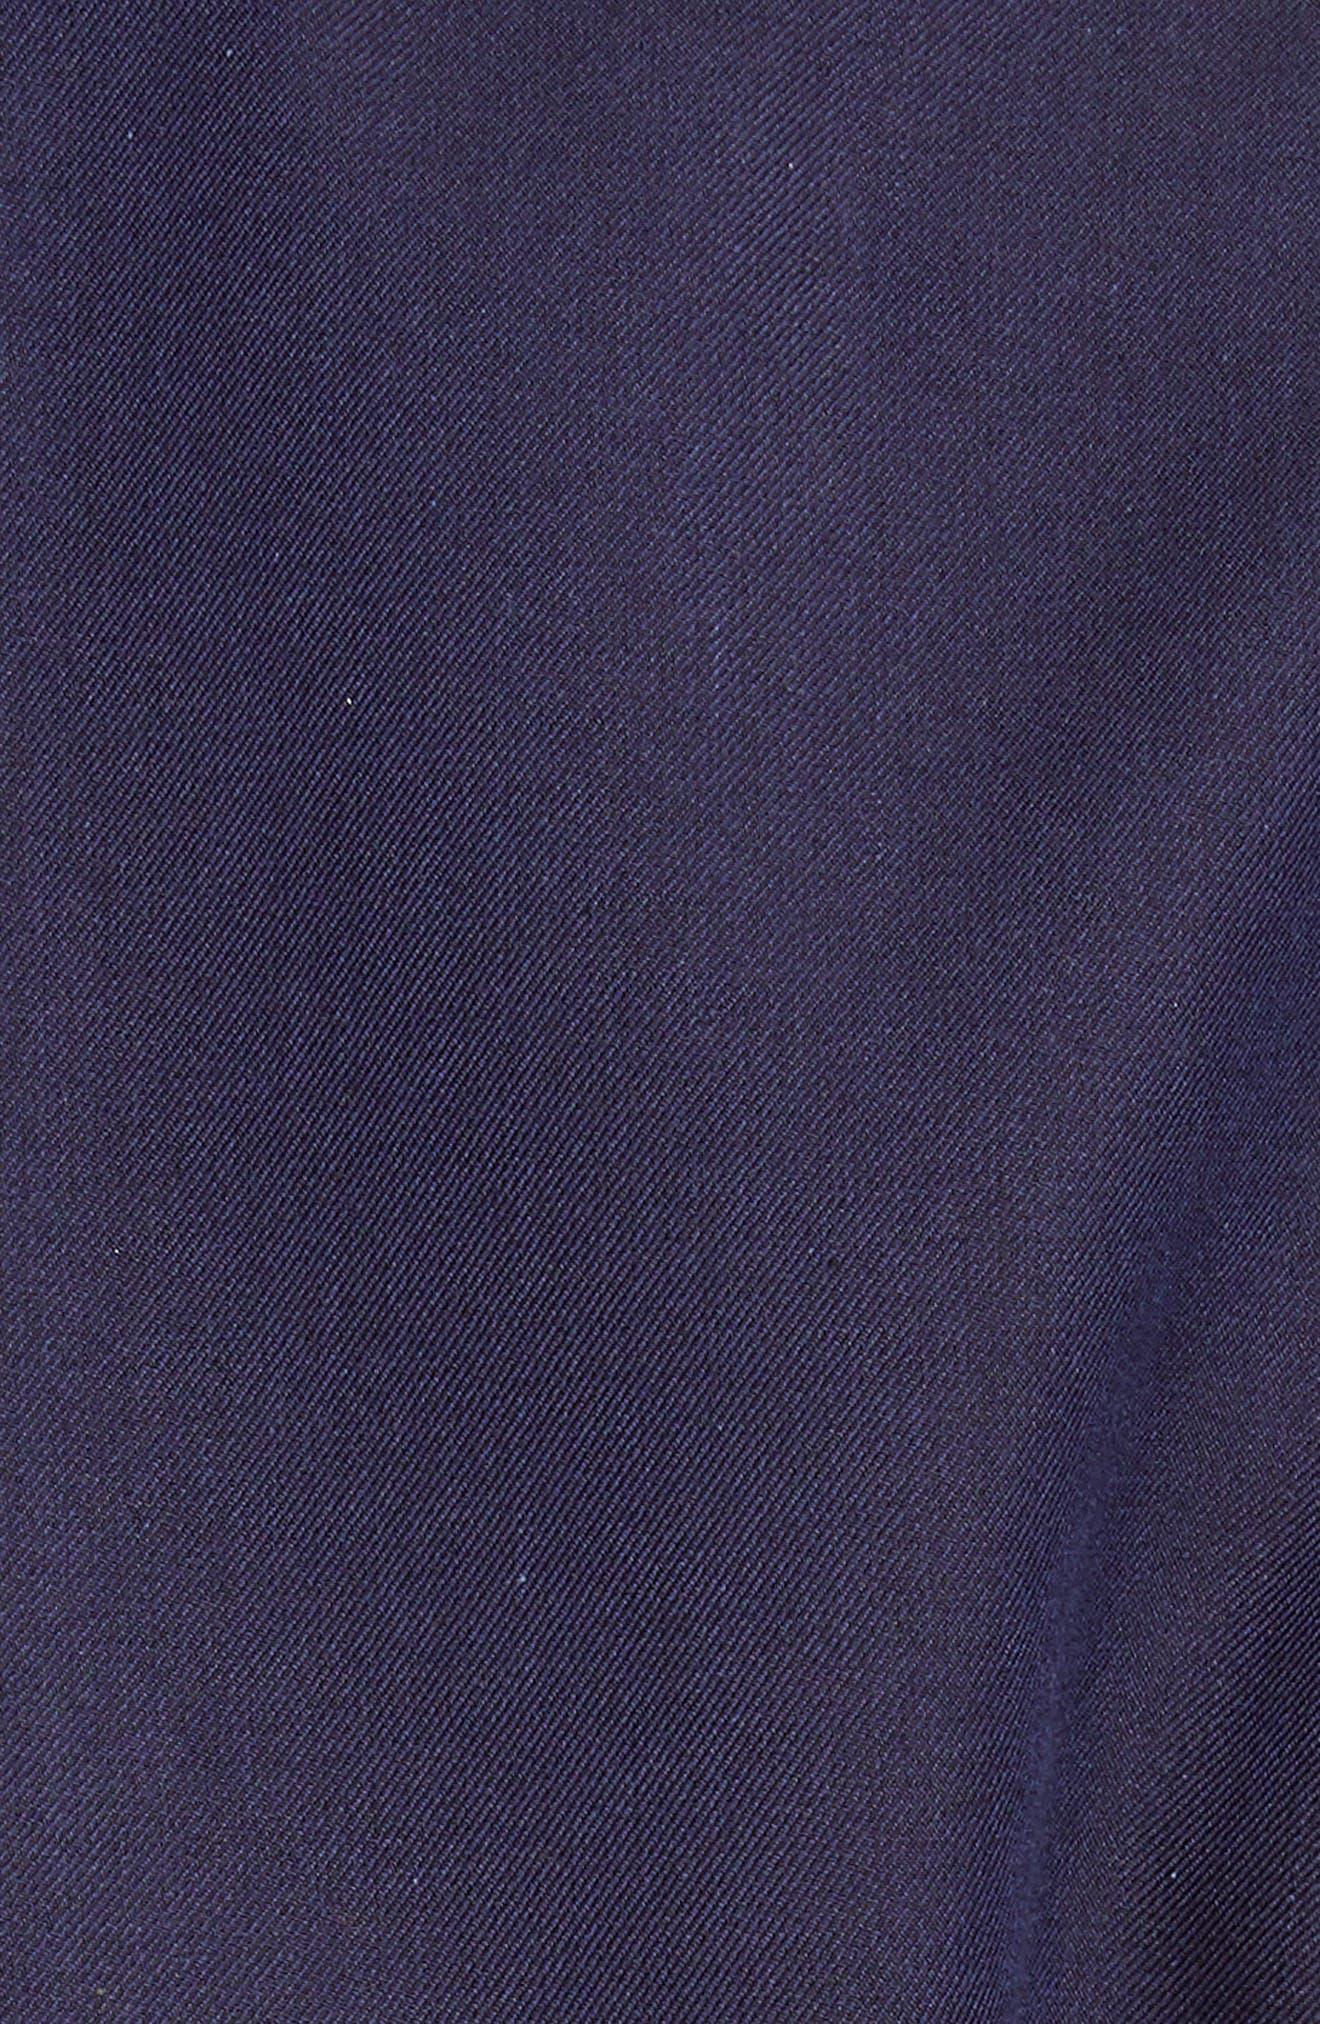 TRICOT COMME DES GARÇONS, Gabardine Blazer with Print Lining, Alternate thumbnail 6, color, NAVY